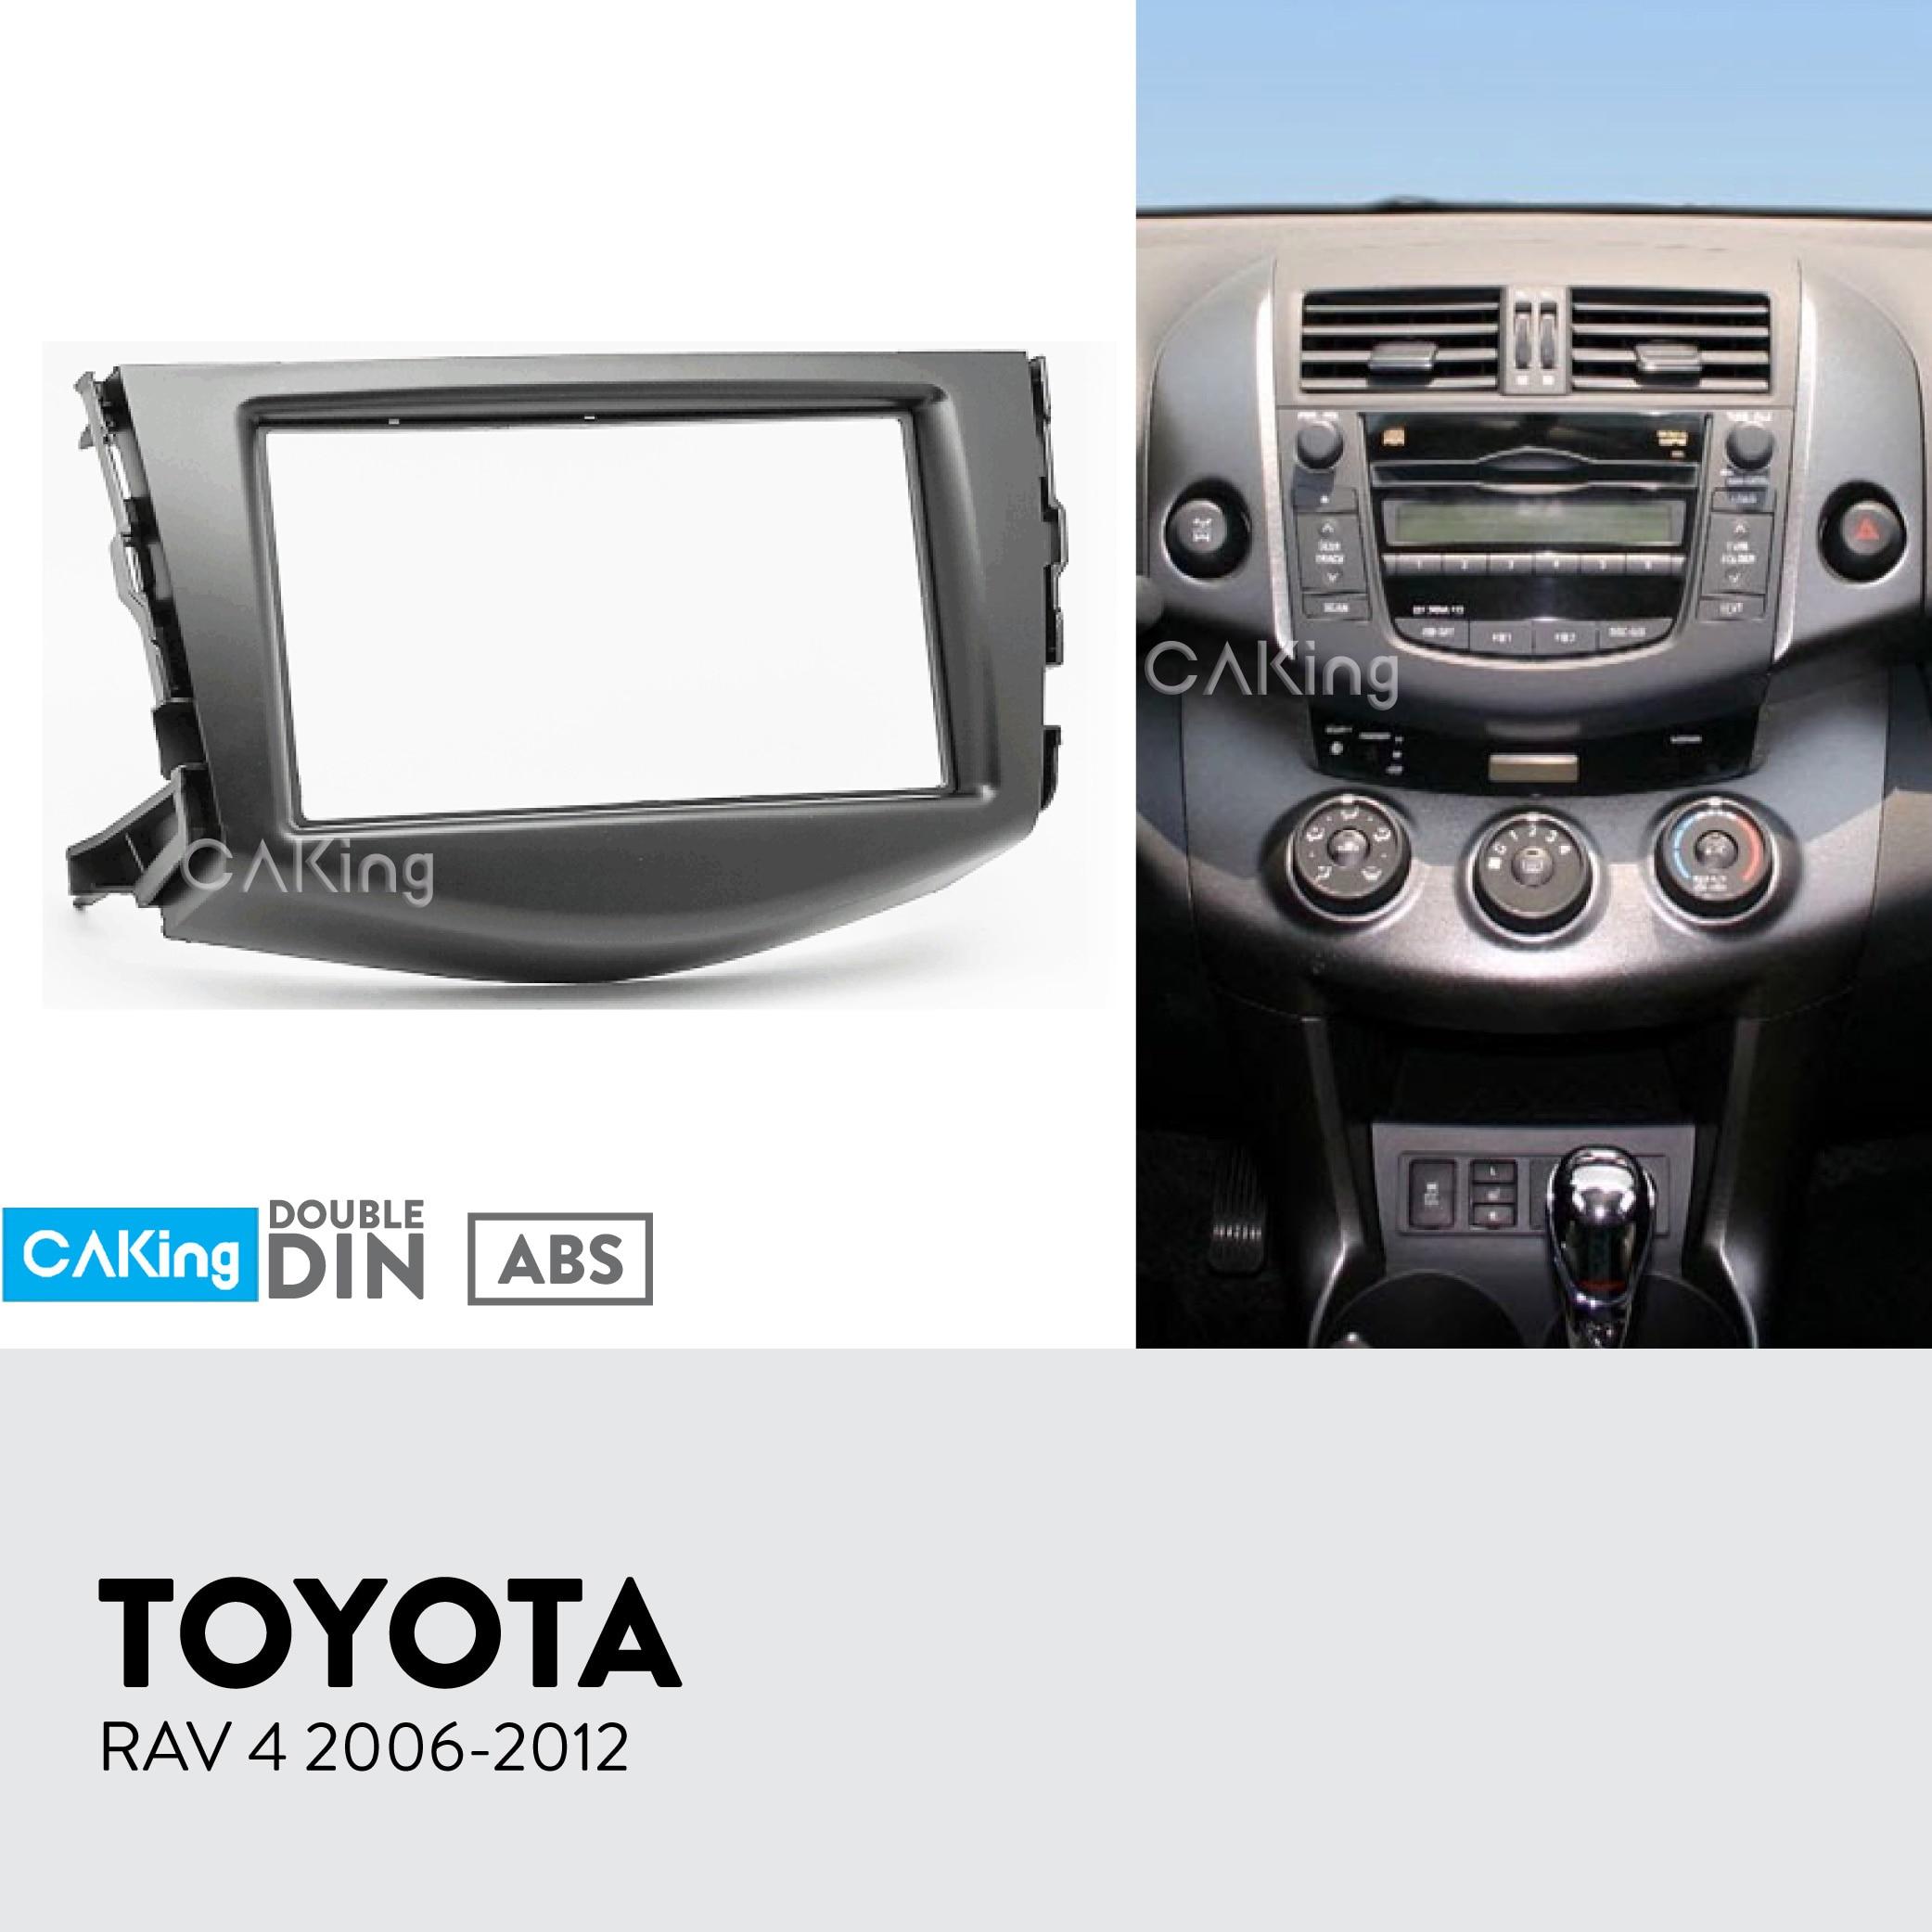 CT23TY84 pour TOYOTA RAV4 2001-2005 Simple Din Autoradio fascia panel